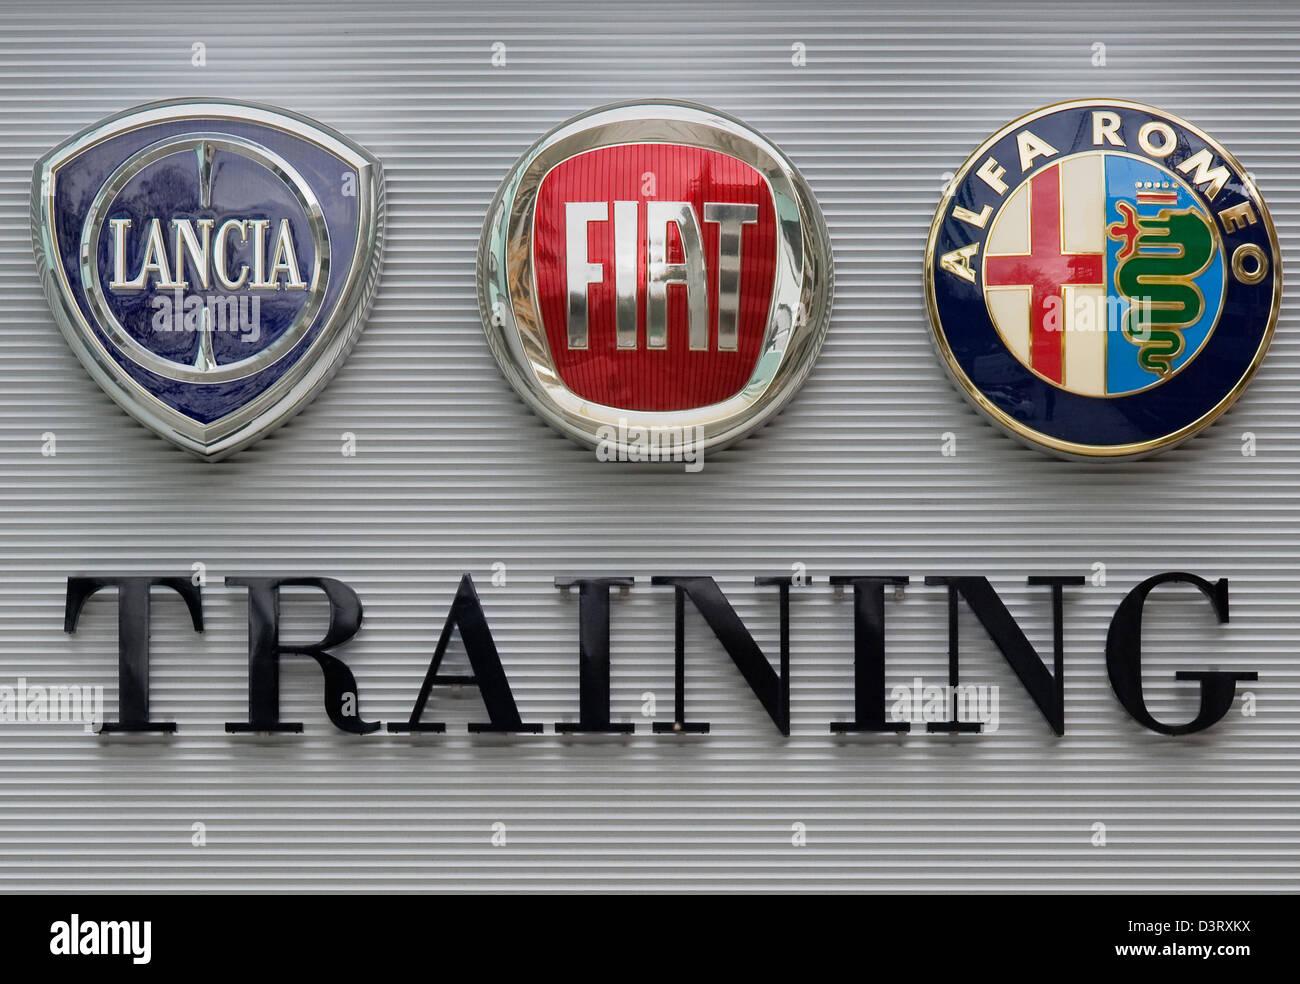 Vienna, Austria, logos of the Italian car brands Lancia, Fiat and Alfa Romeo - Stock Image